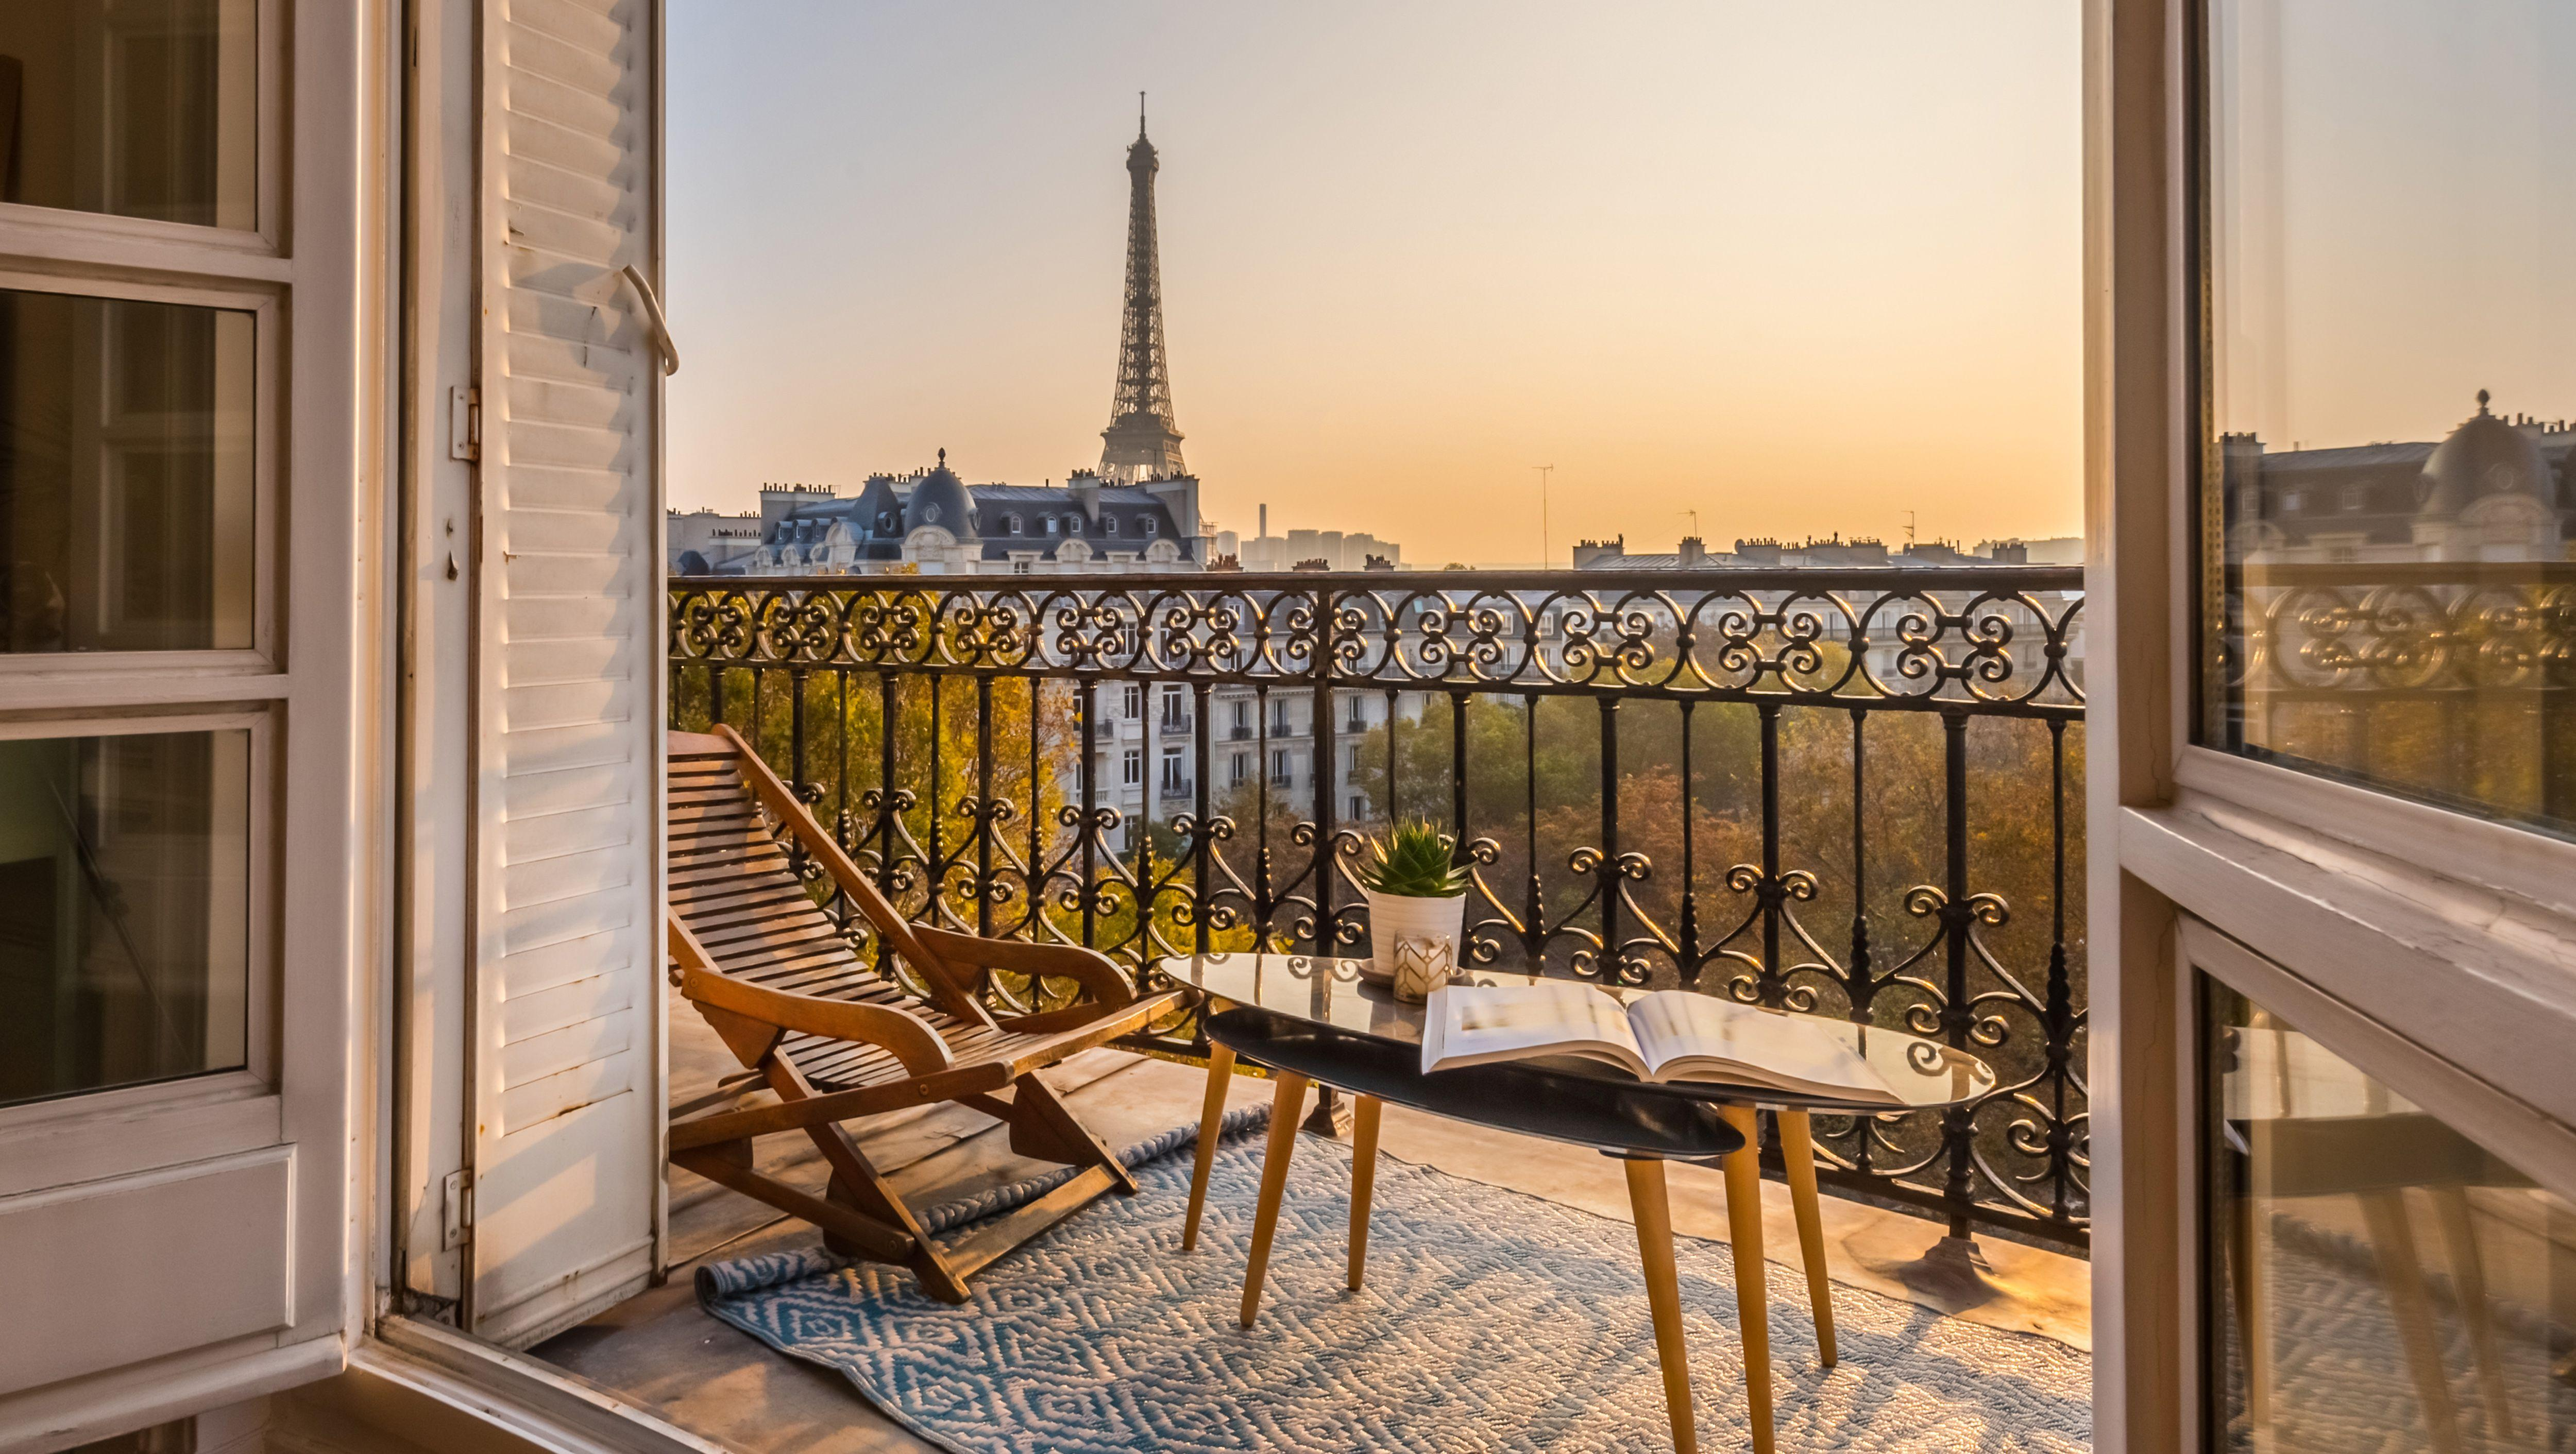 Blick vom Balkon zum Eiffelturm